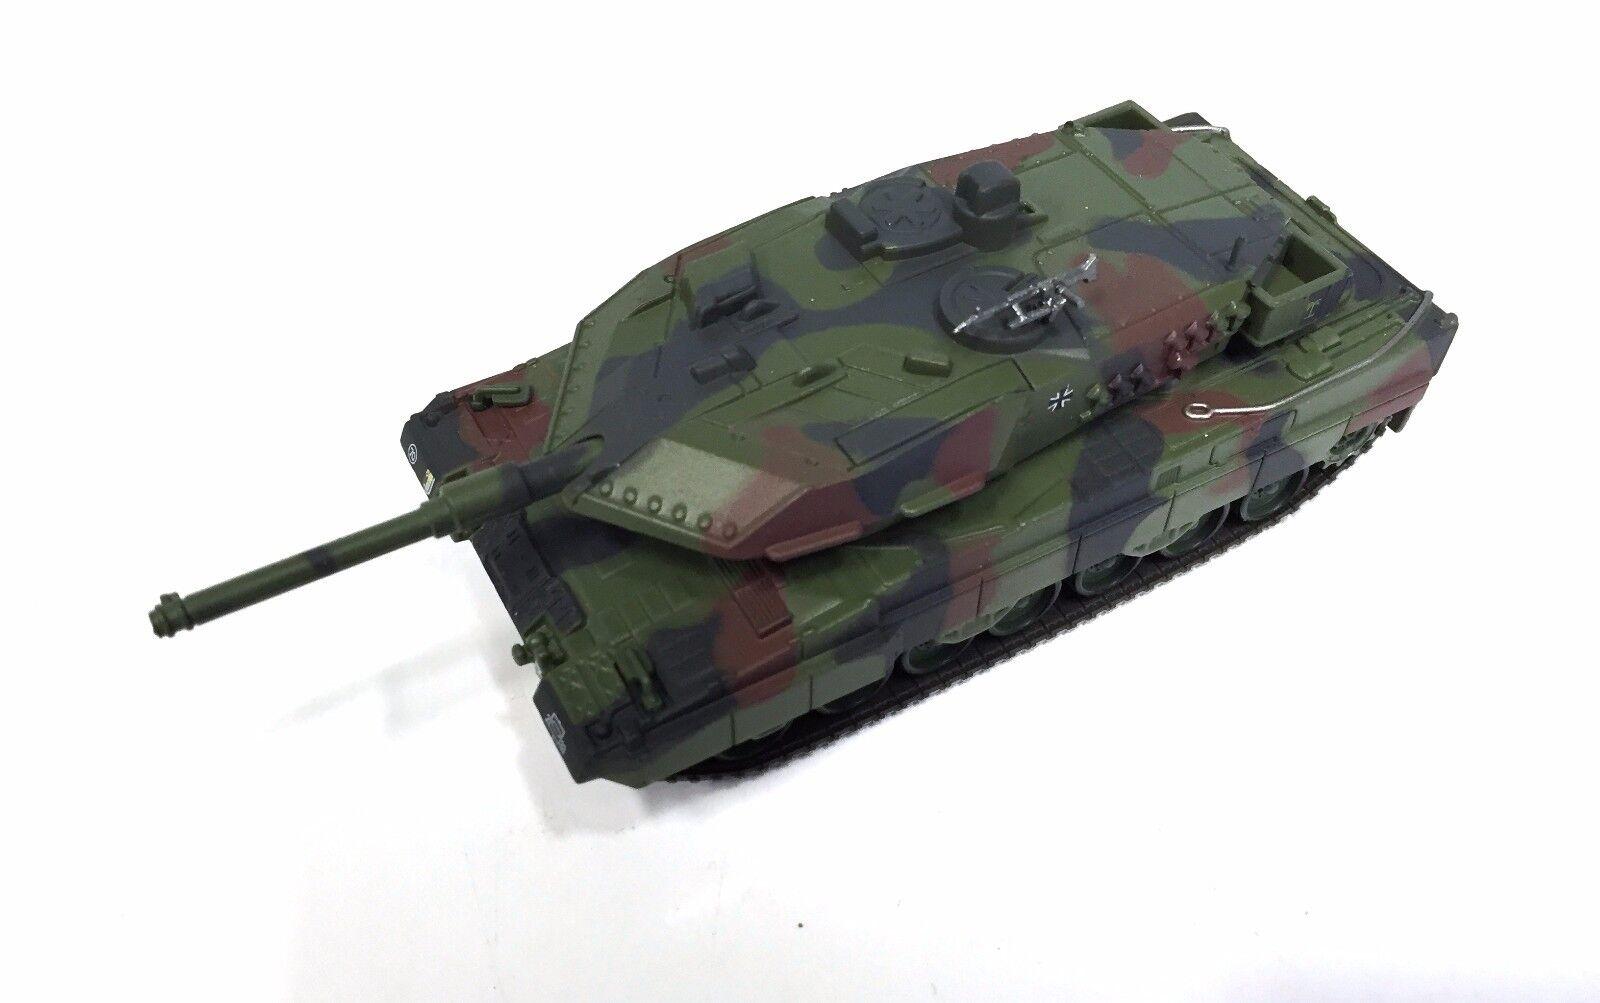 Leopard 2 A5 DK MILITARY VEHICLE 1 72 SCALE - DIECAST ARMY  TANK PANZER GUN -3